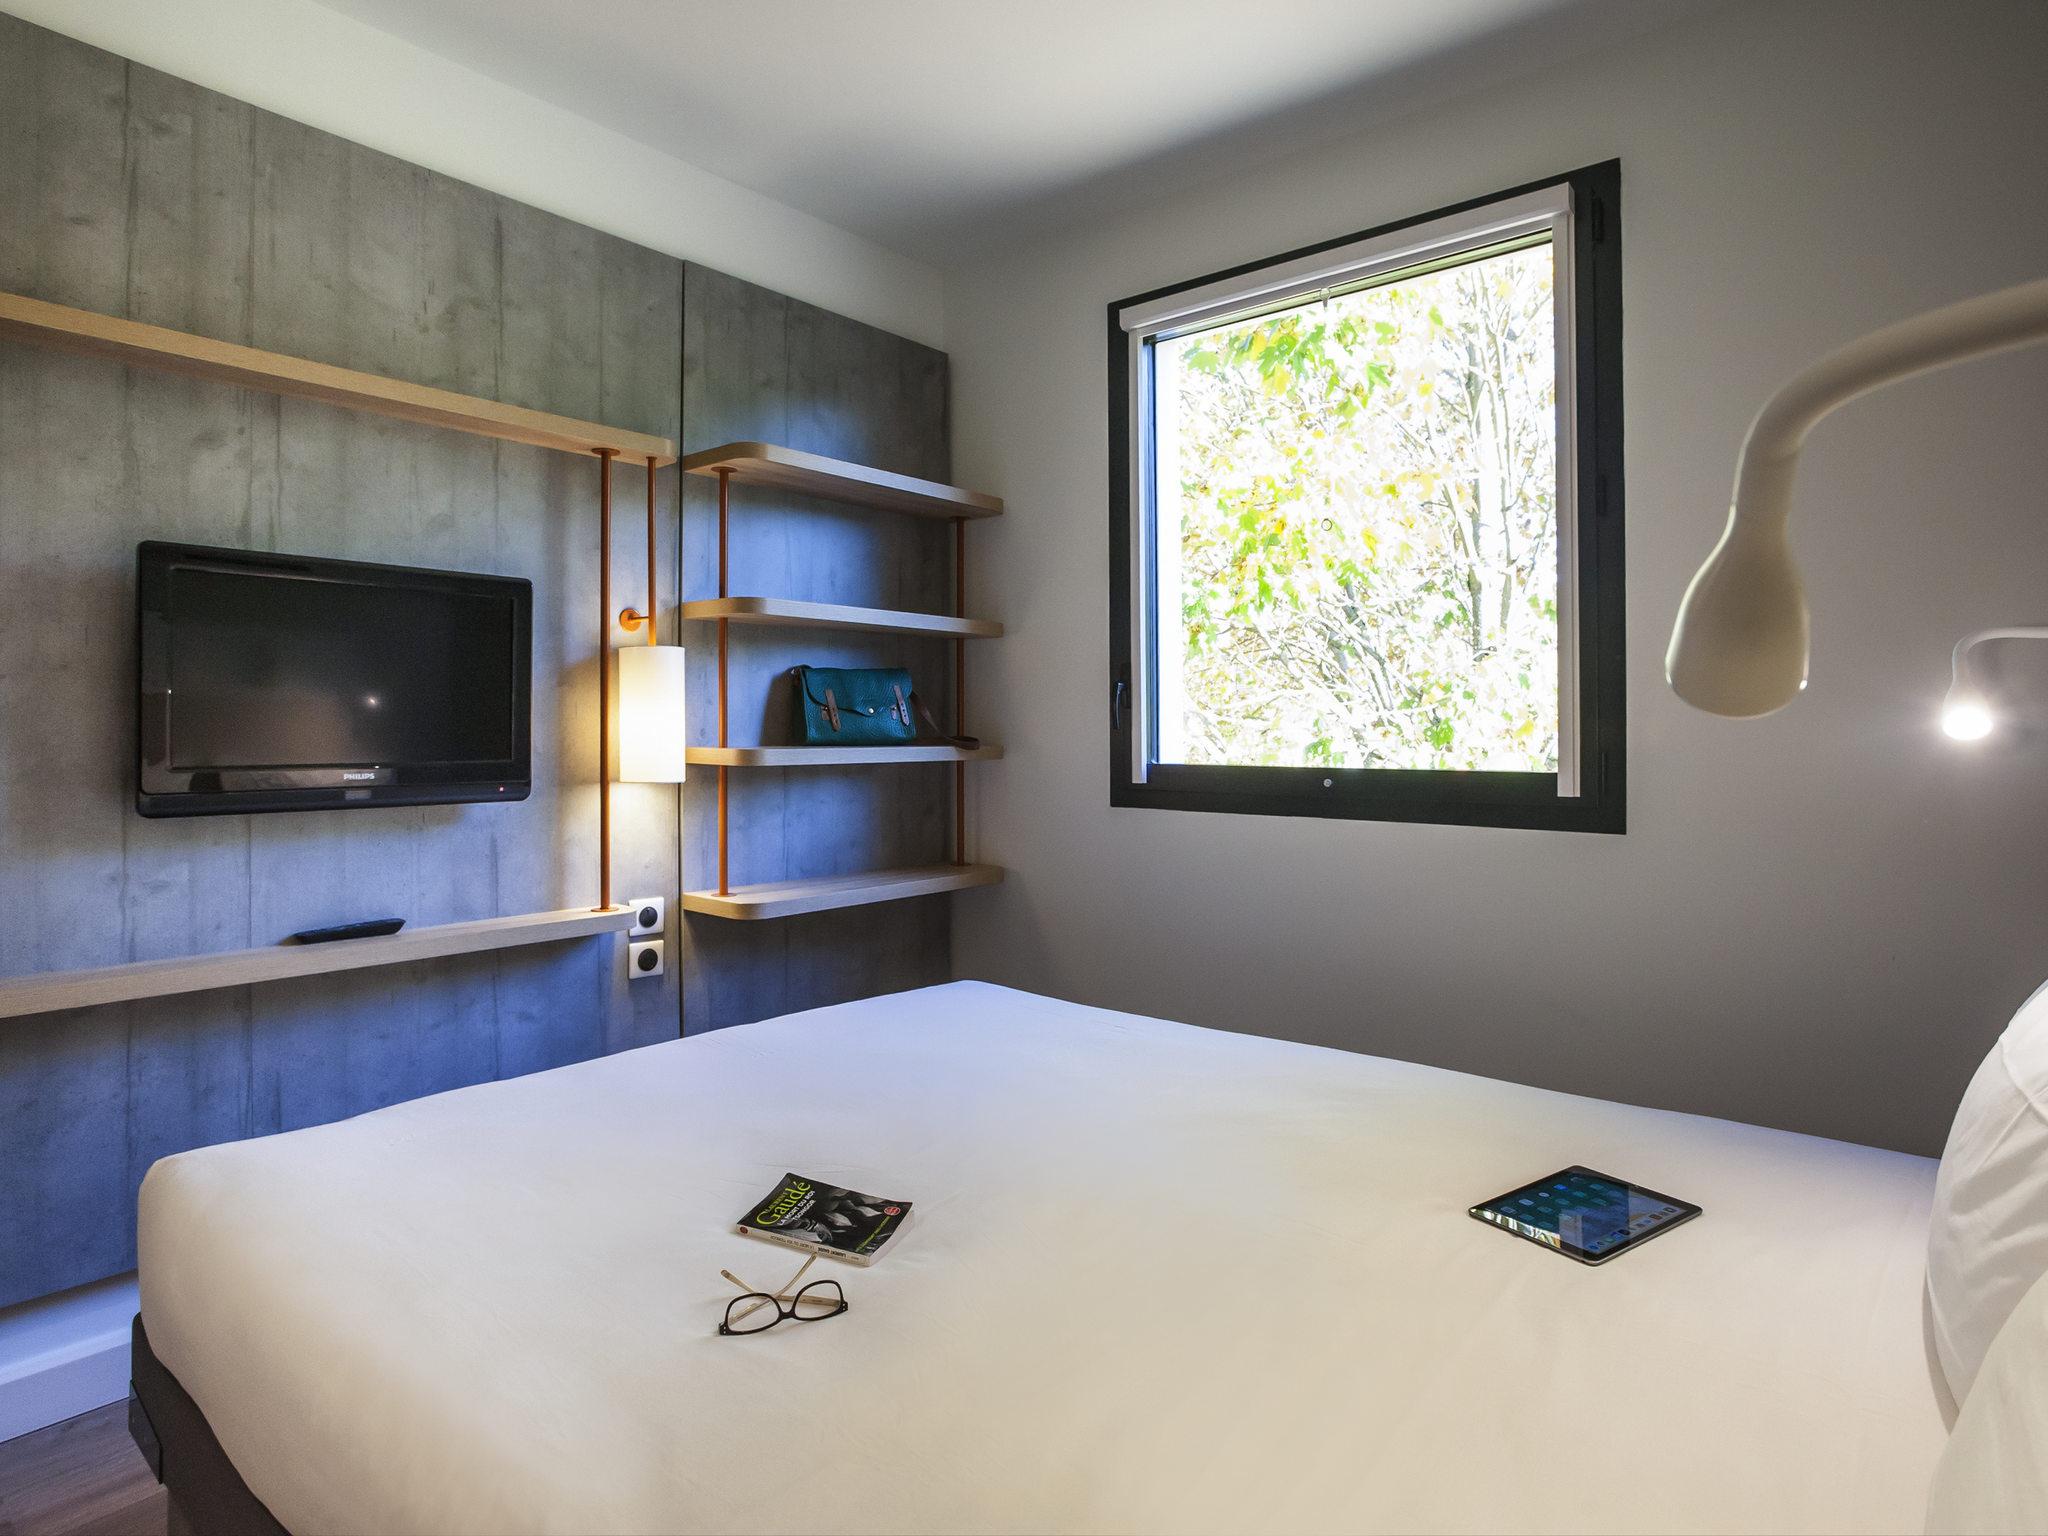 Hotel – ibis budget Château-Thierry (apertura: giugno 2018)